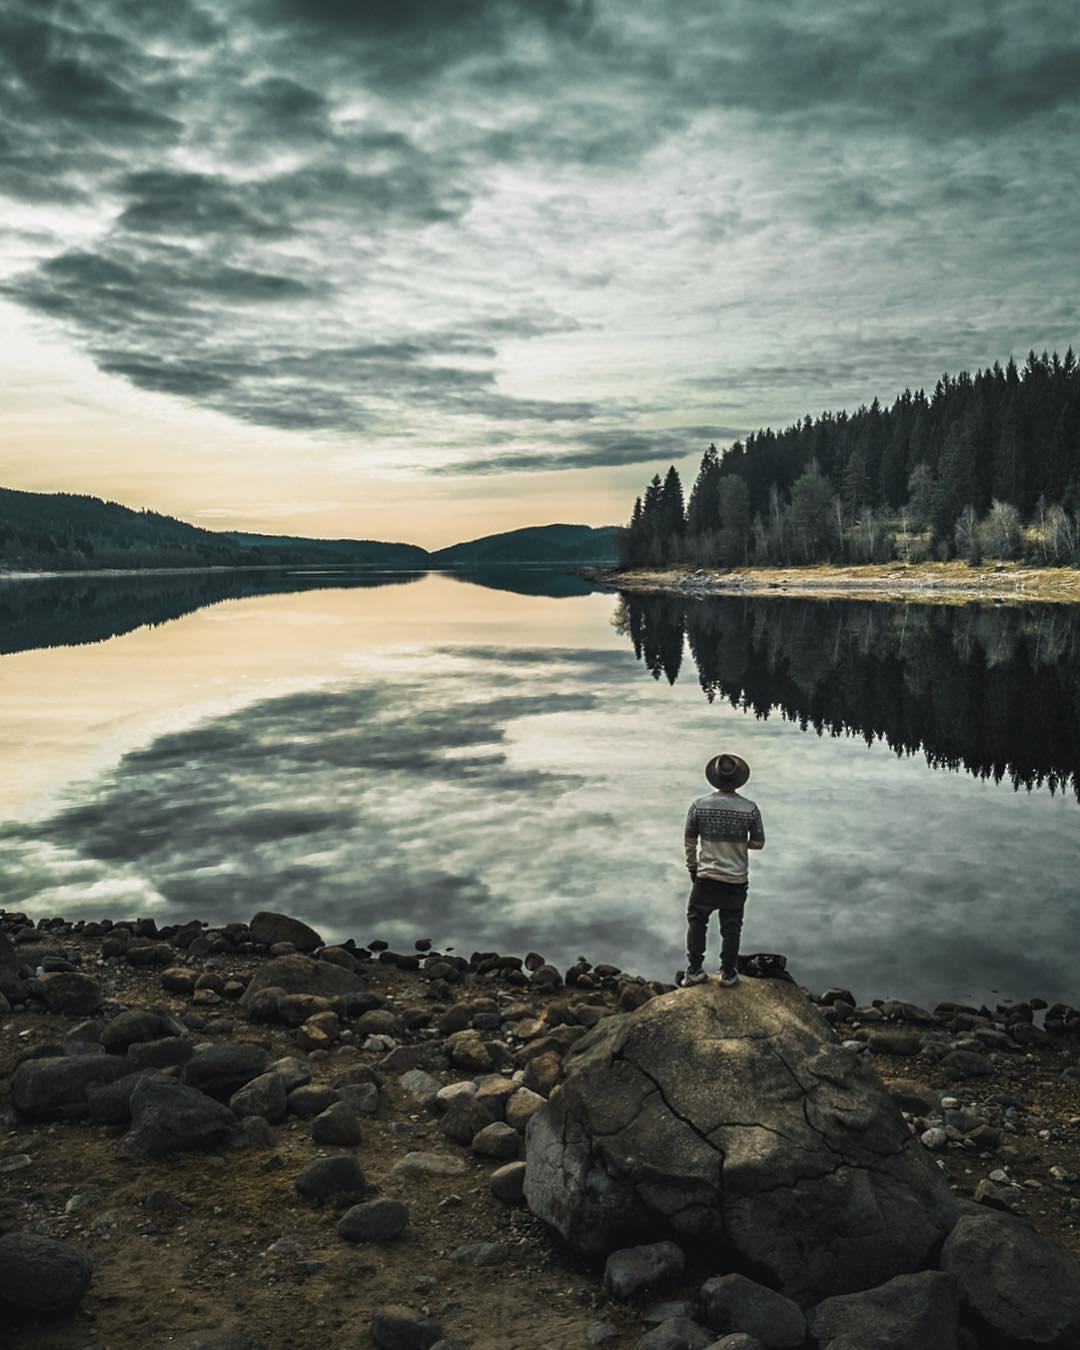 Путешествия, пейзажи и аэрофотоснимки от Джулио Греберта